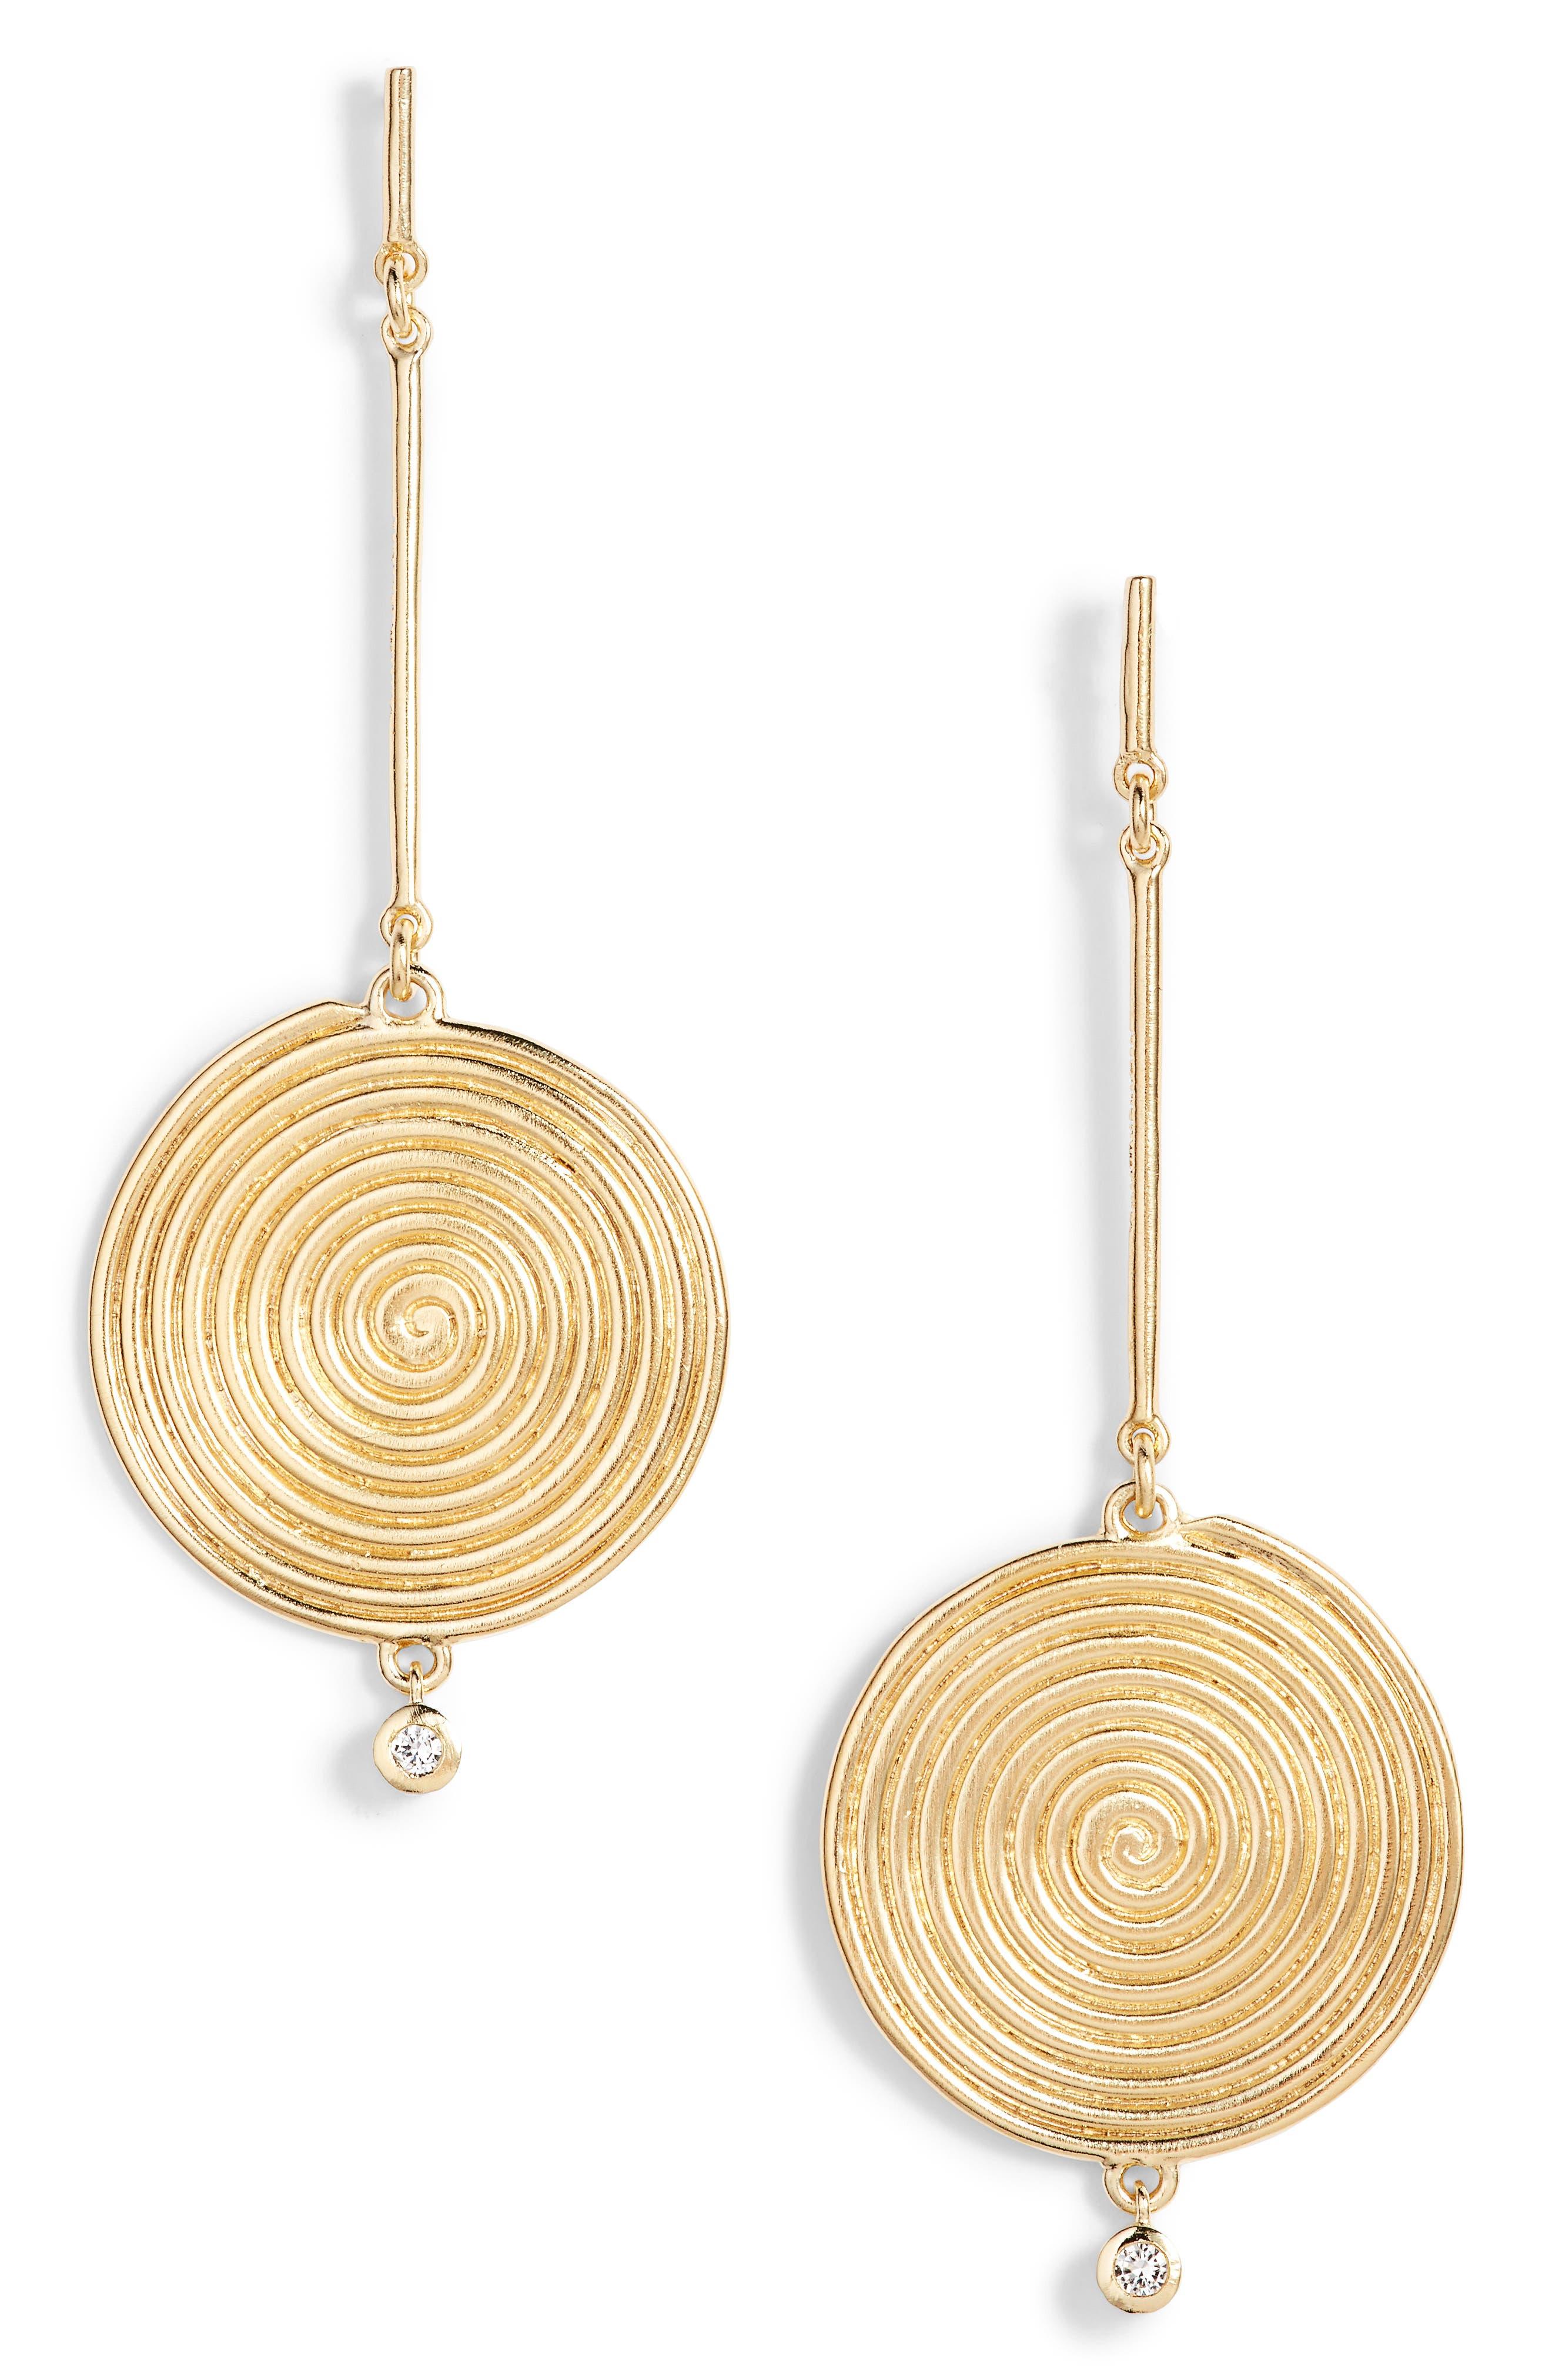 Elizabeth and James Sullivan - Lainey White Topaz Drop Earrings